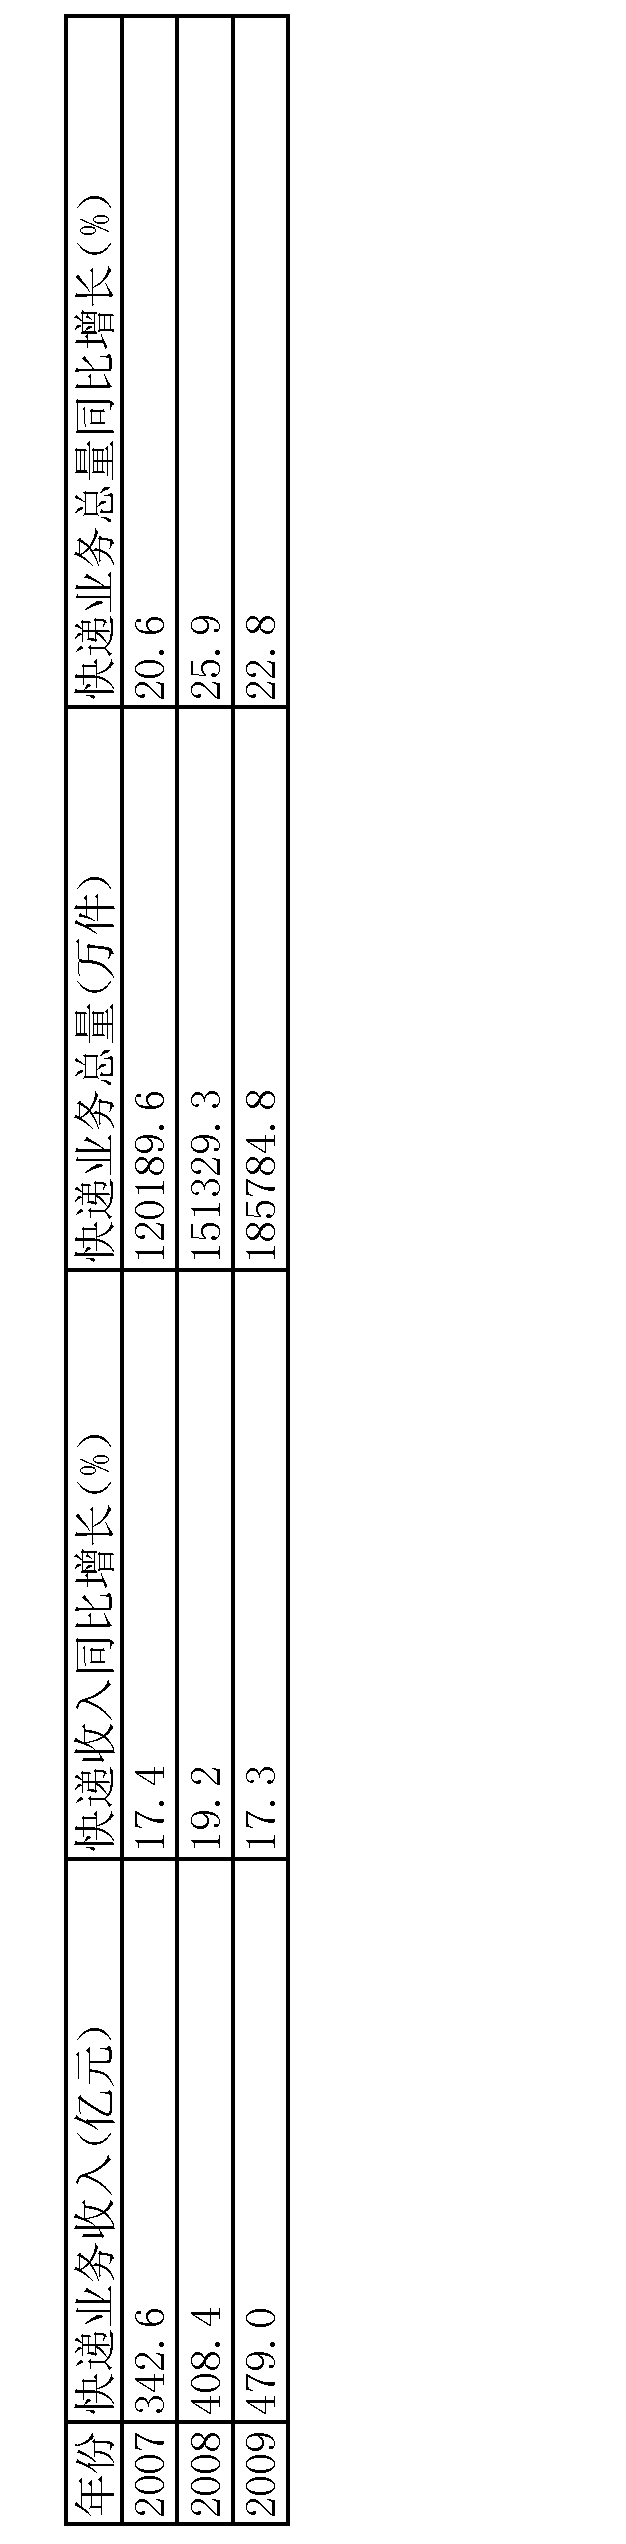 Figure CN202080448UD00041